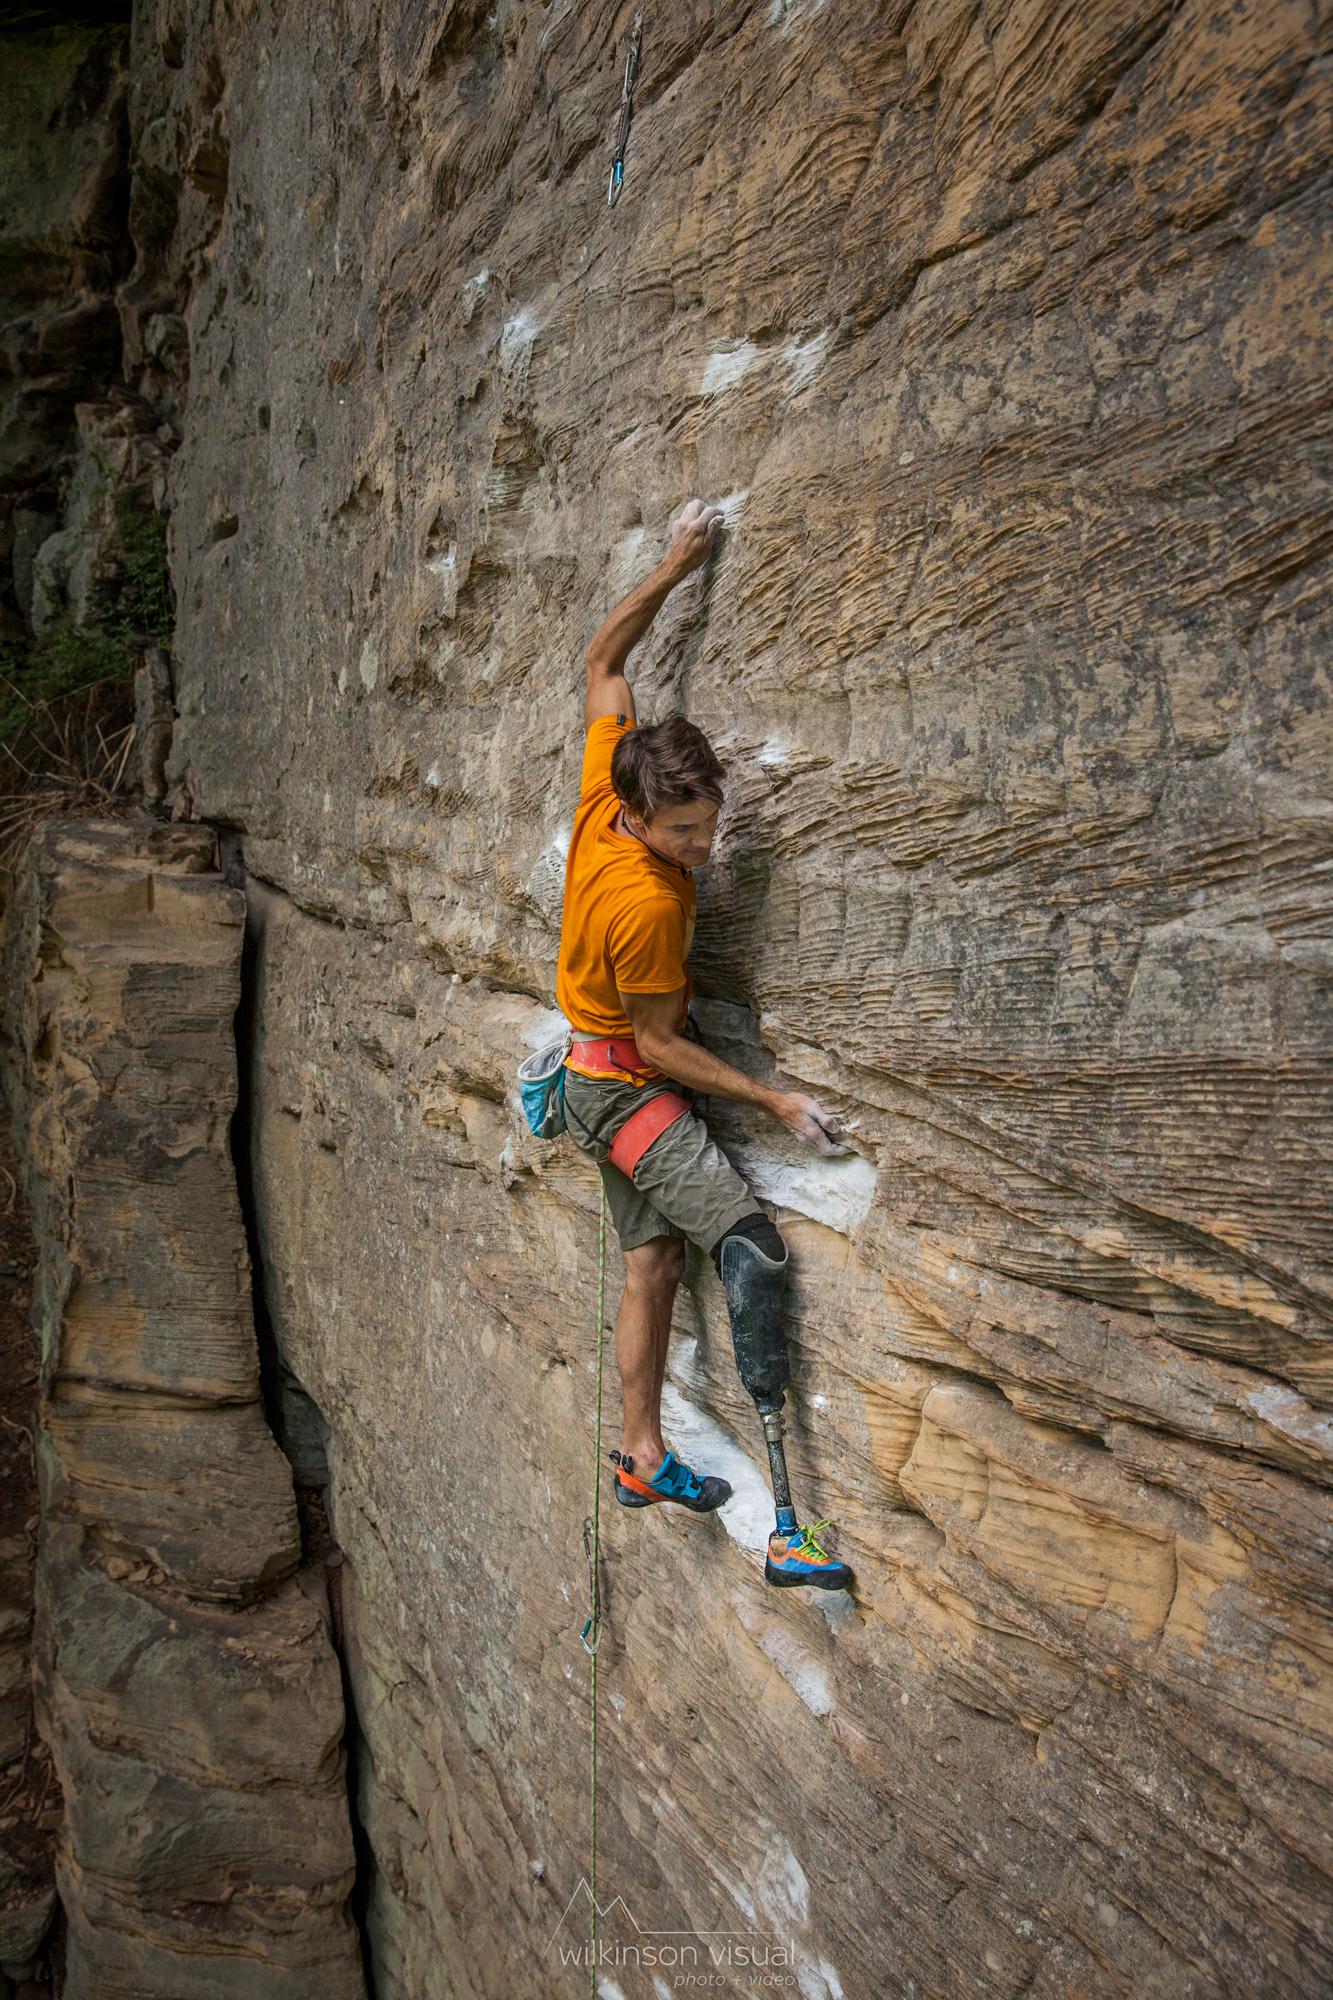 demartino-climbing-9903-Edit.jpg